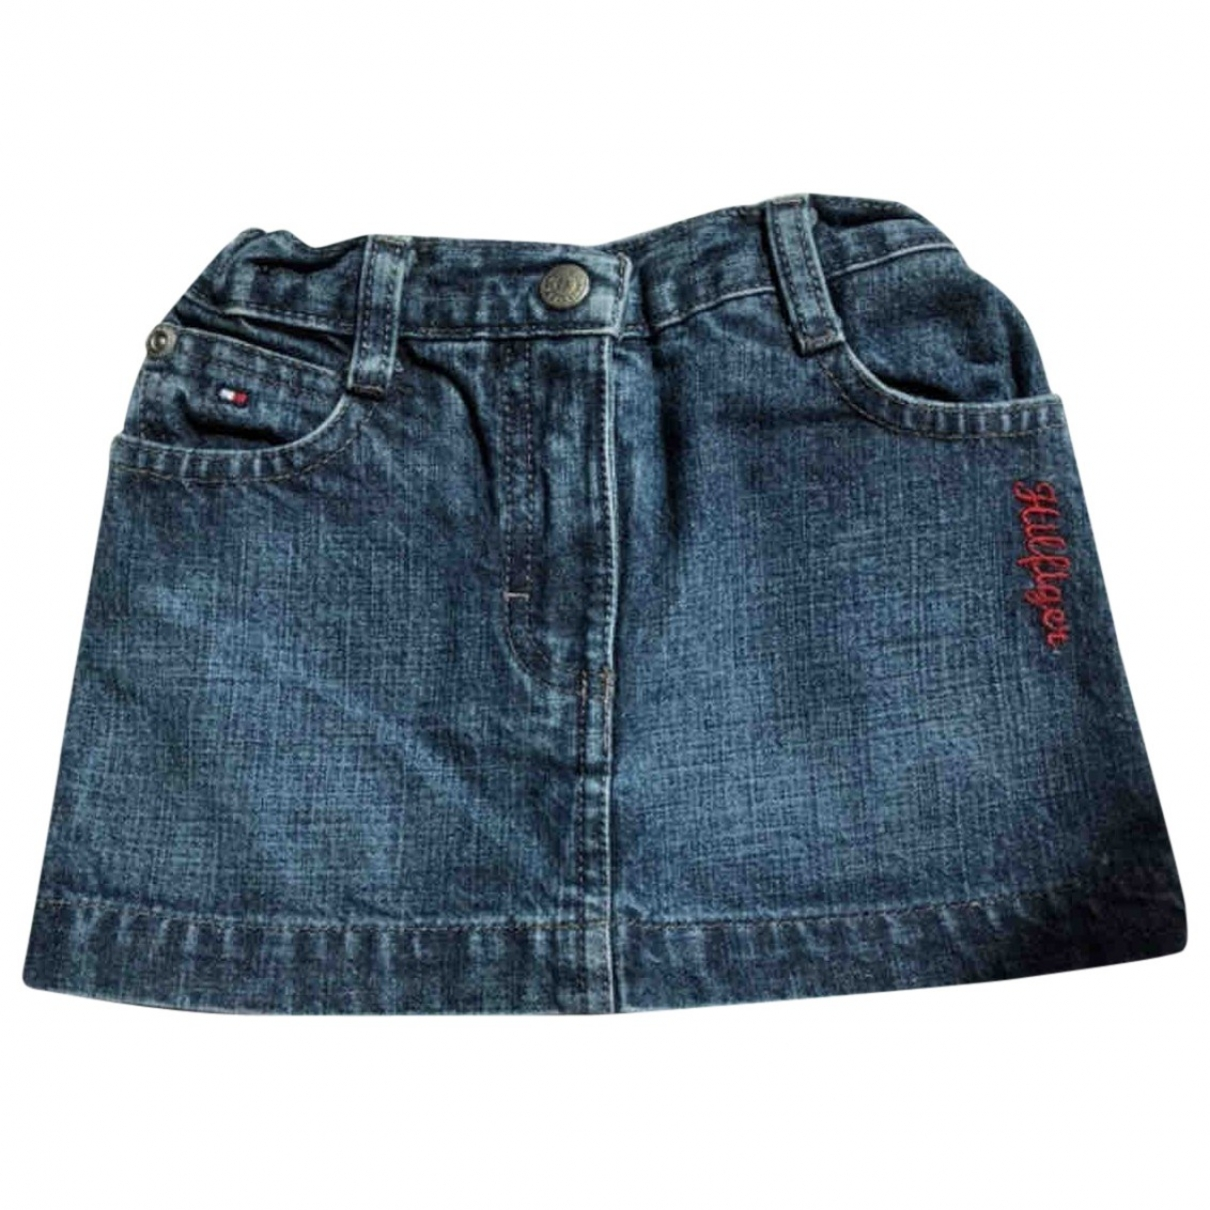 Tommy Hilfiger \N Blue Cotton skirt for Kids 9 months - up to 71cm FR